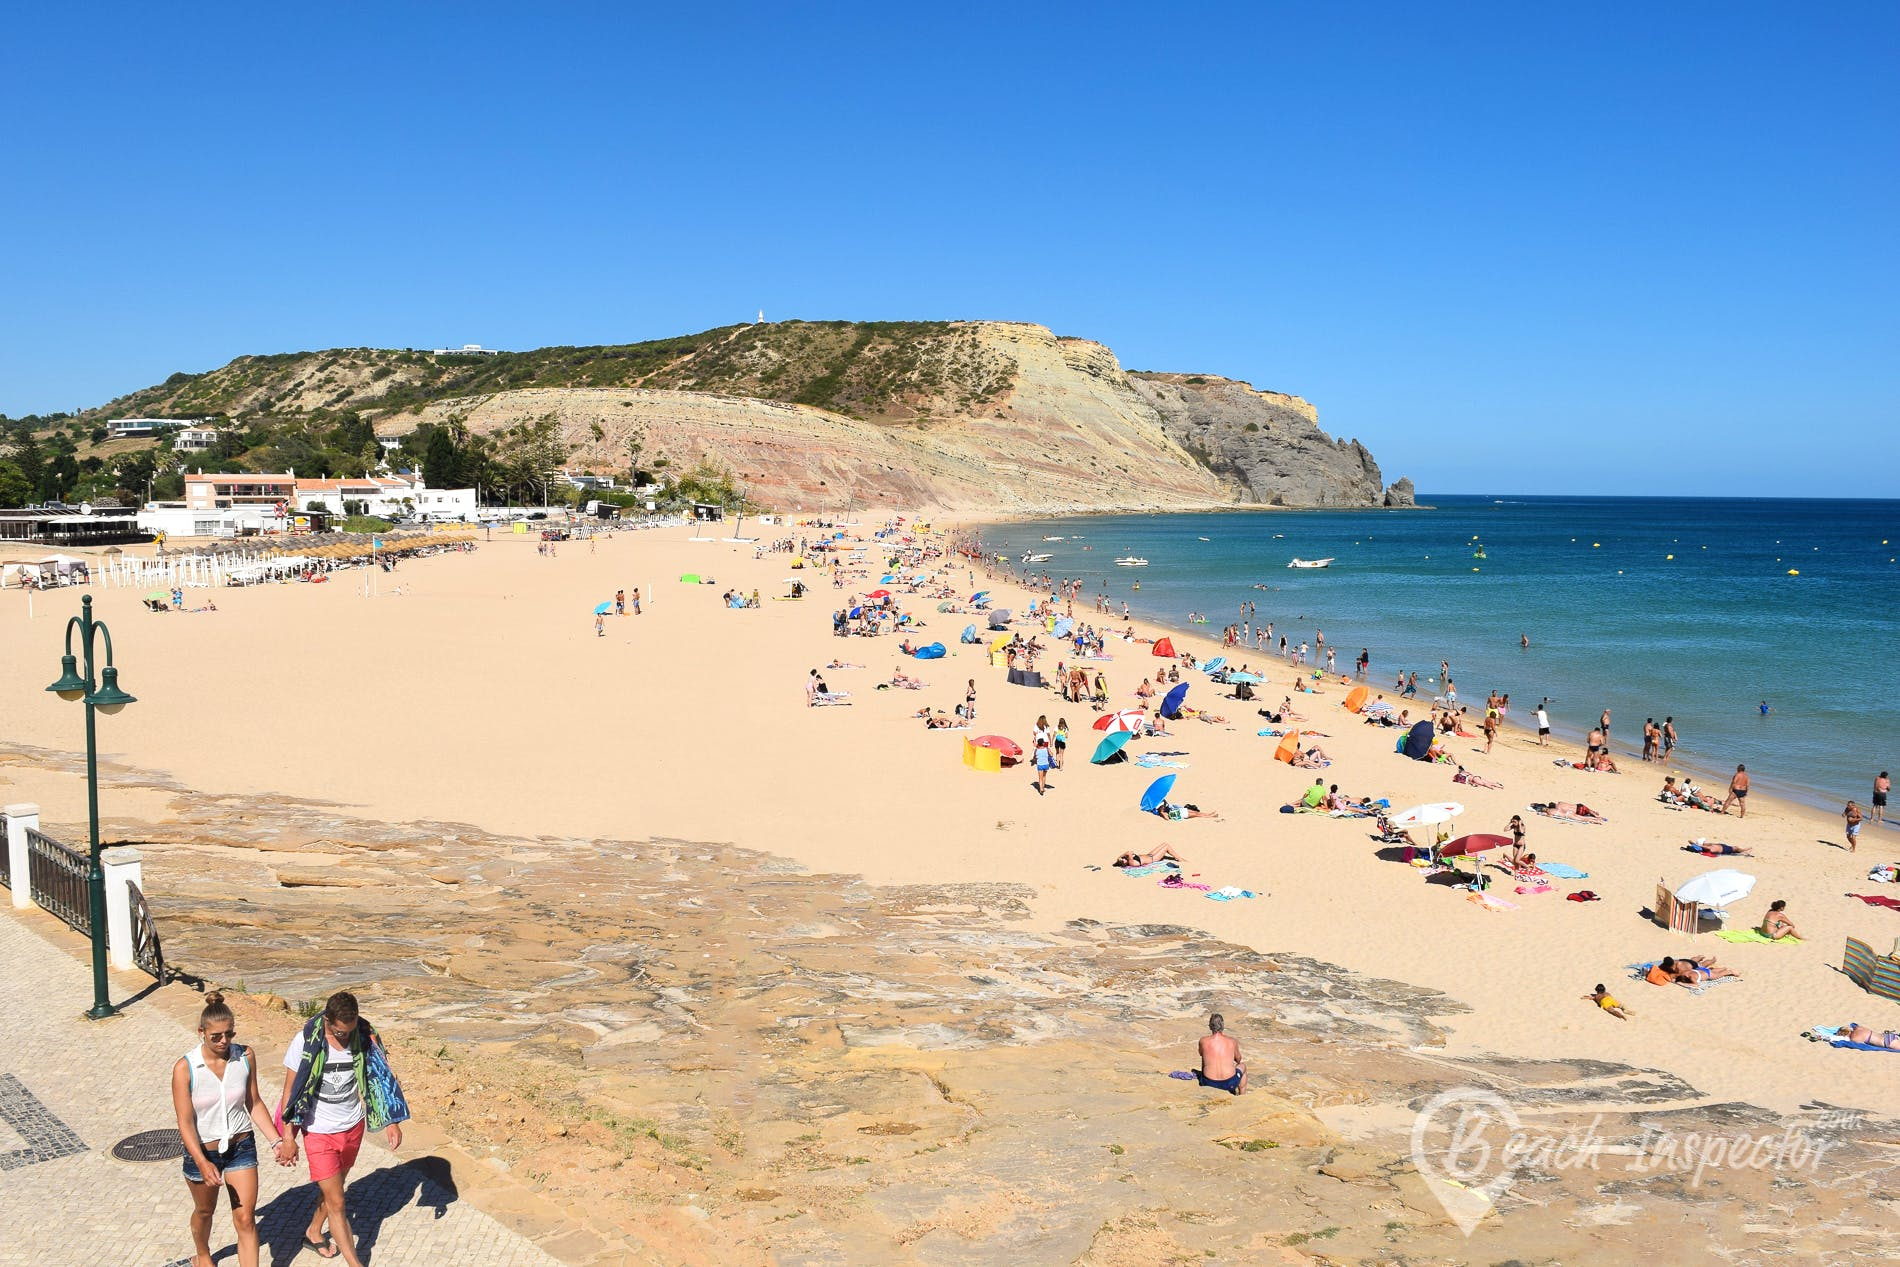 Beach Praia da Luz, Algarve, Portugal